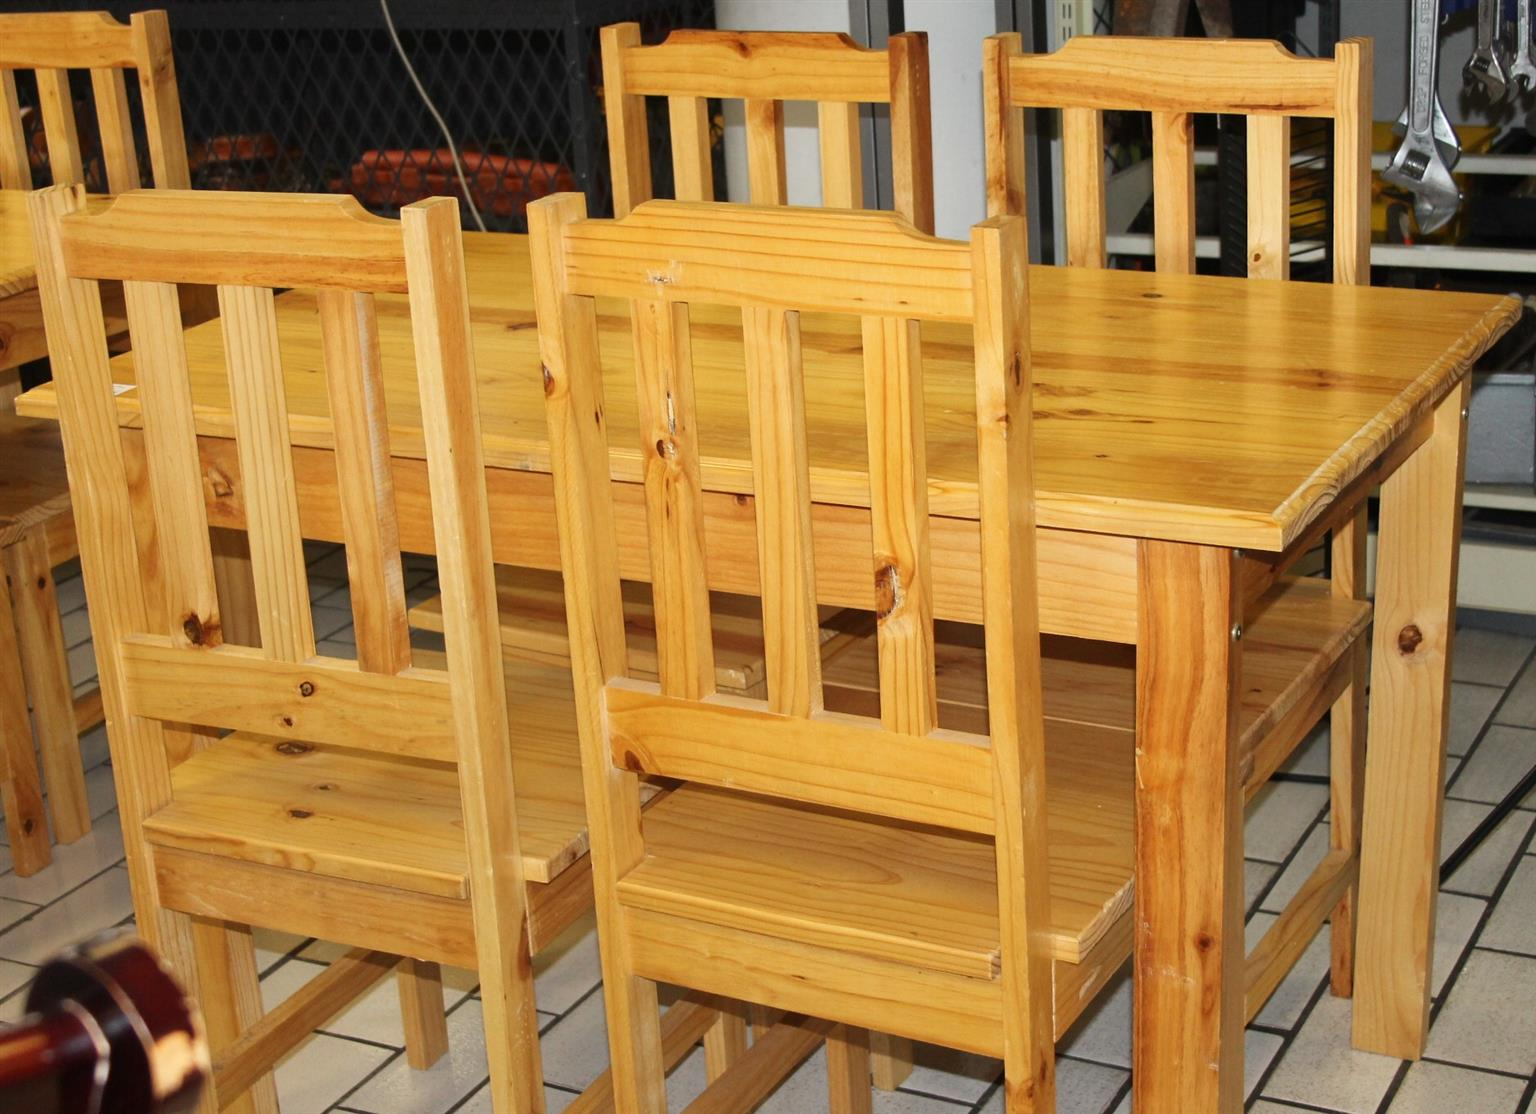 Kitchen set S028250a #Rosettenvillepawnshop